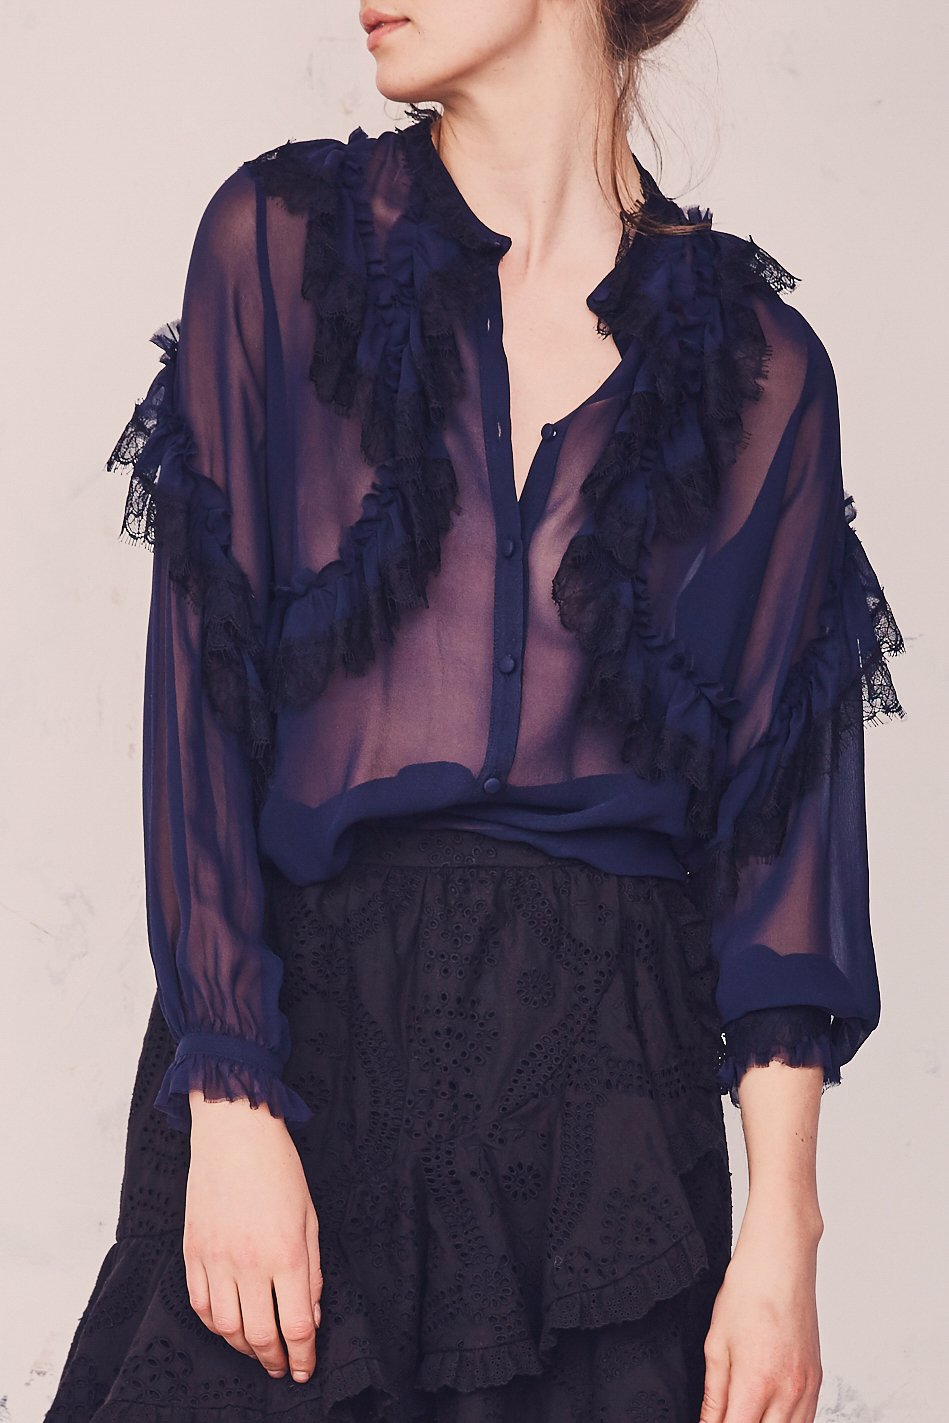 LoveShackFancy_Silk_georgette_with_lace_trim_navy_black_Clara_top_1024x.jpg